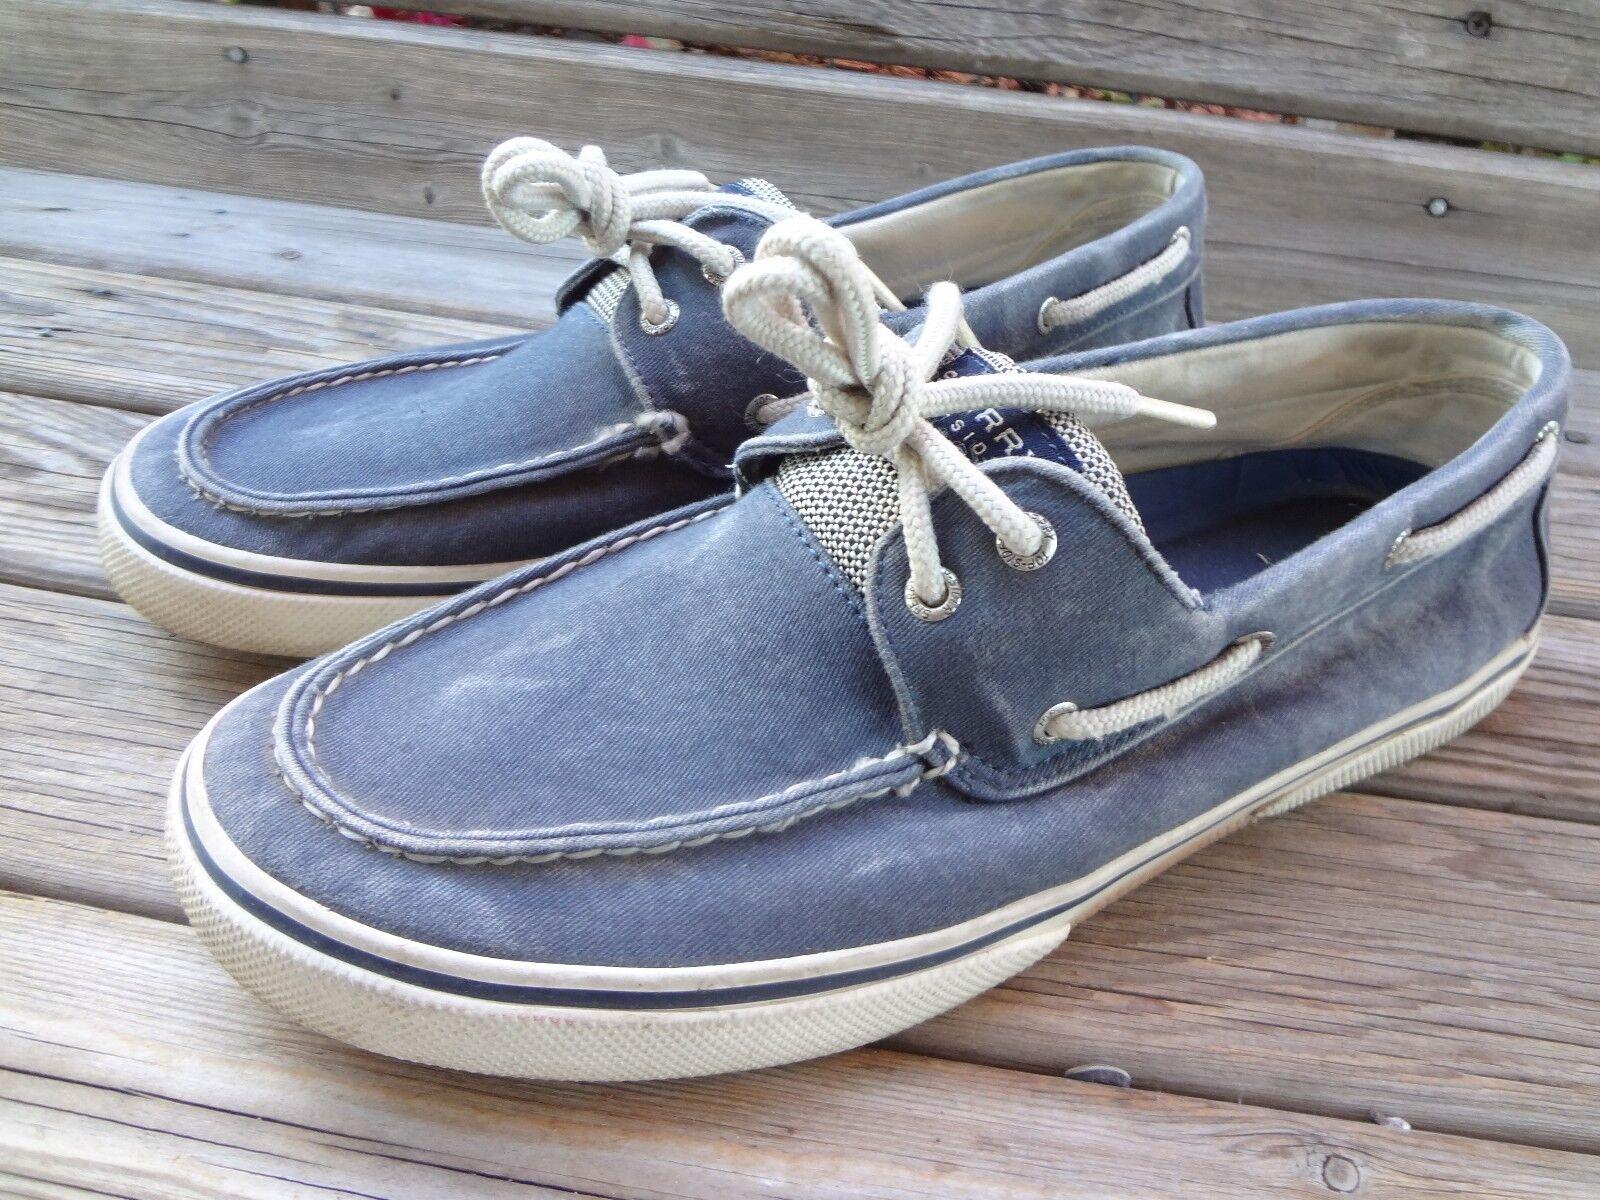 Sperry Top Sider Bahama Mens Boat shoes Sz 12 Canvas Salt Washed Grey Deck 2 Eye